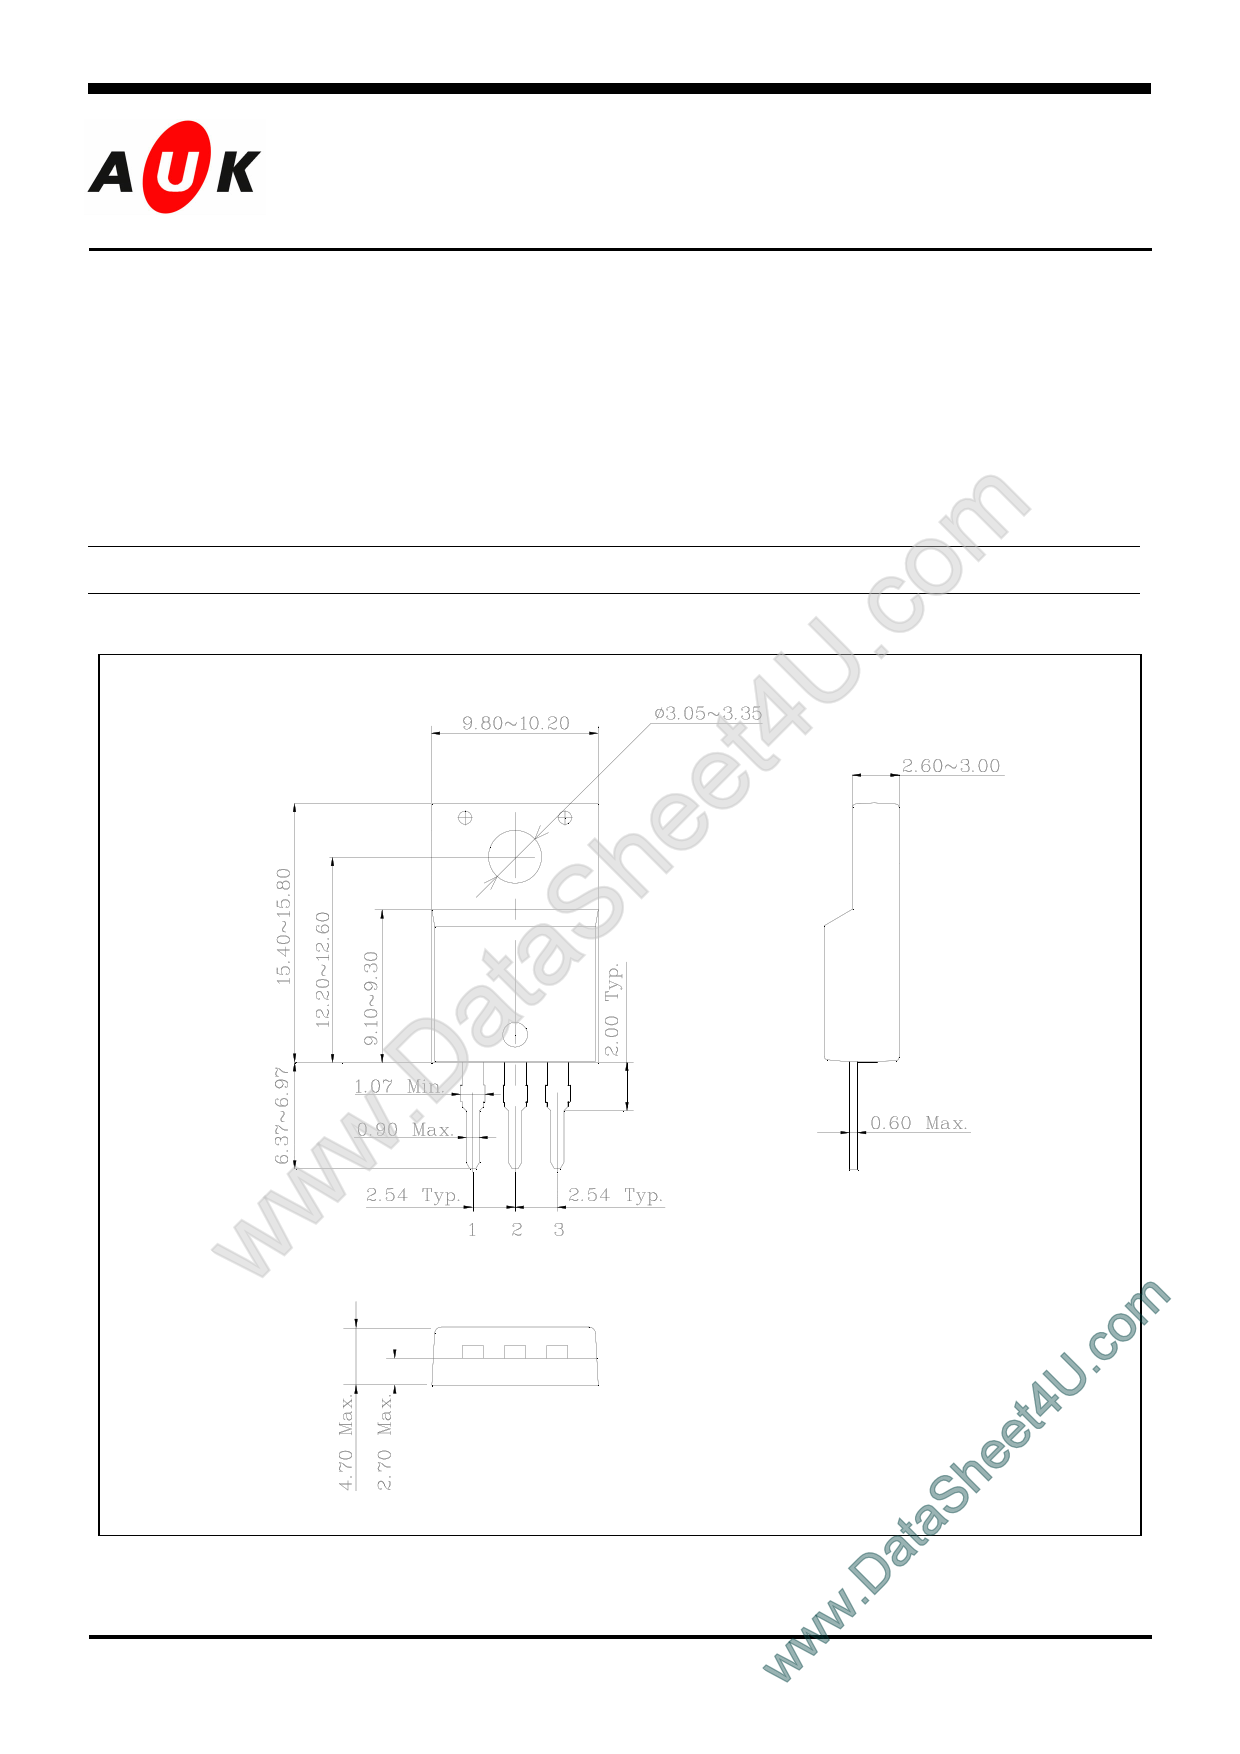 STK630FC image